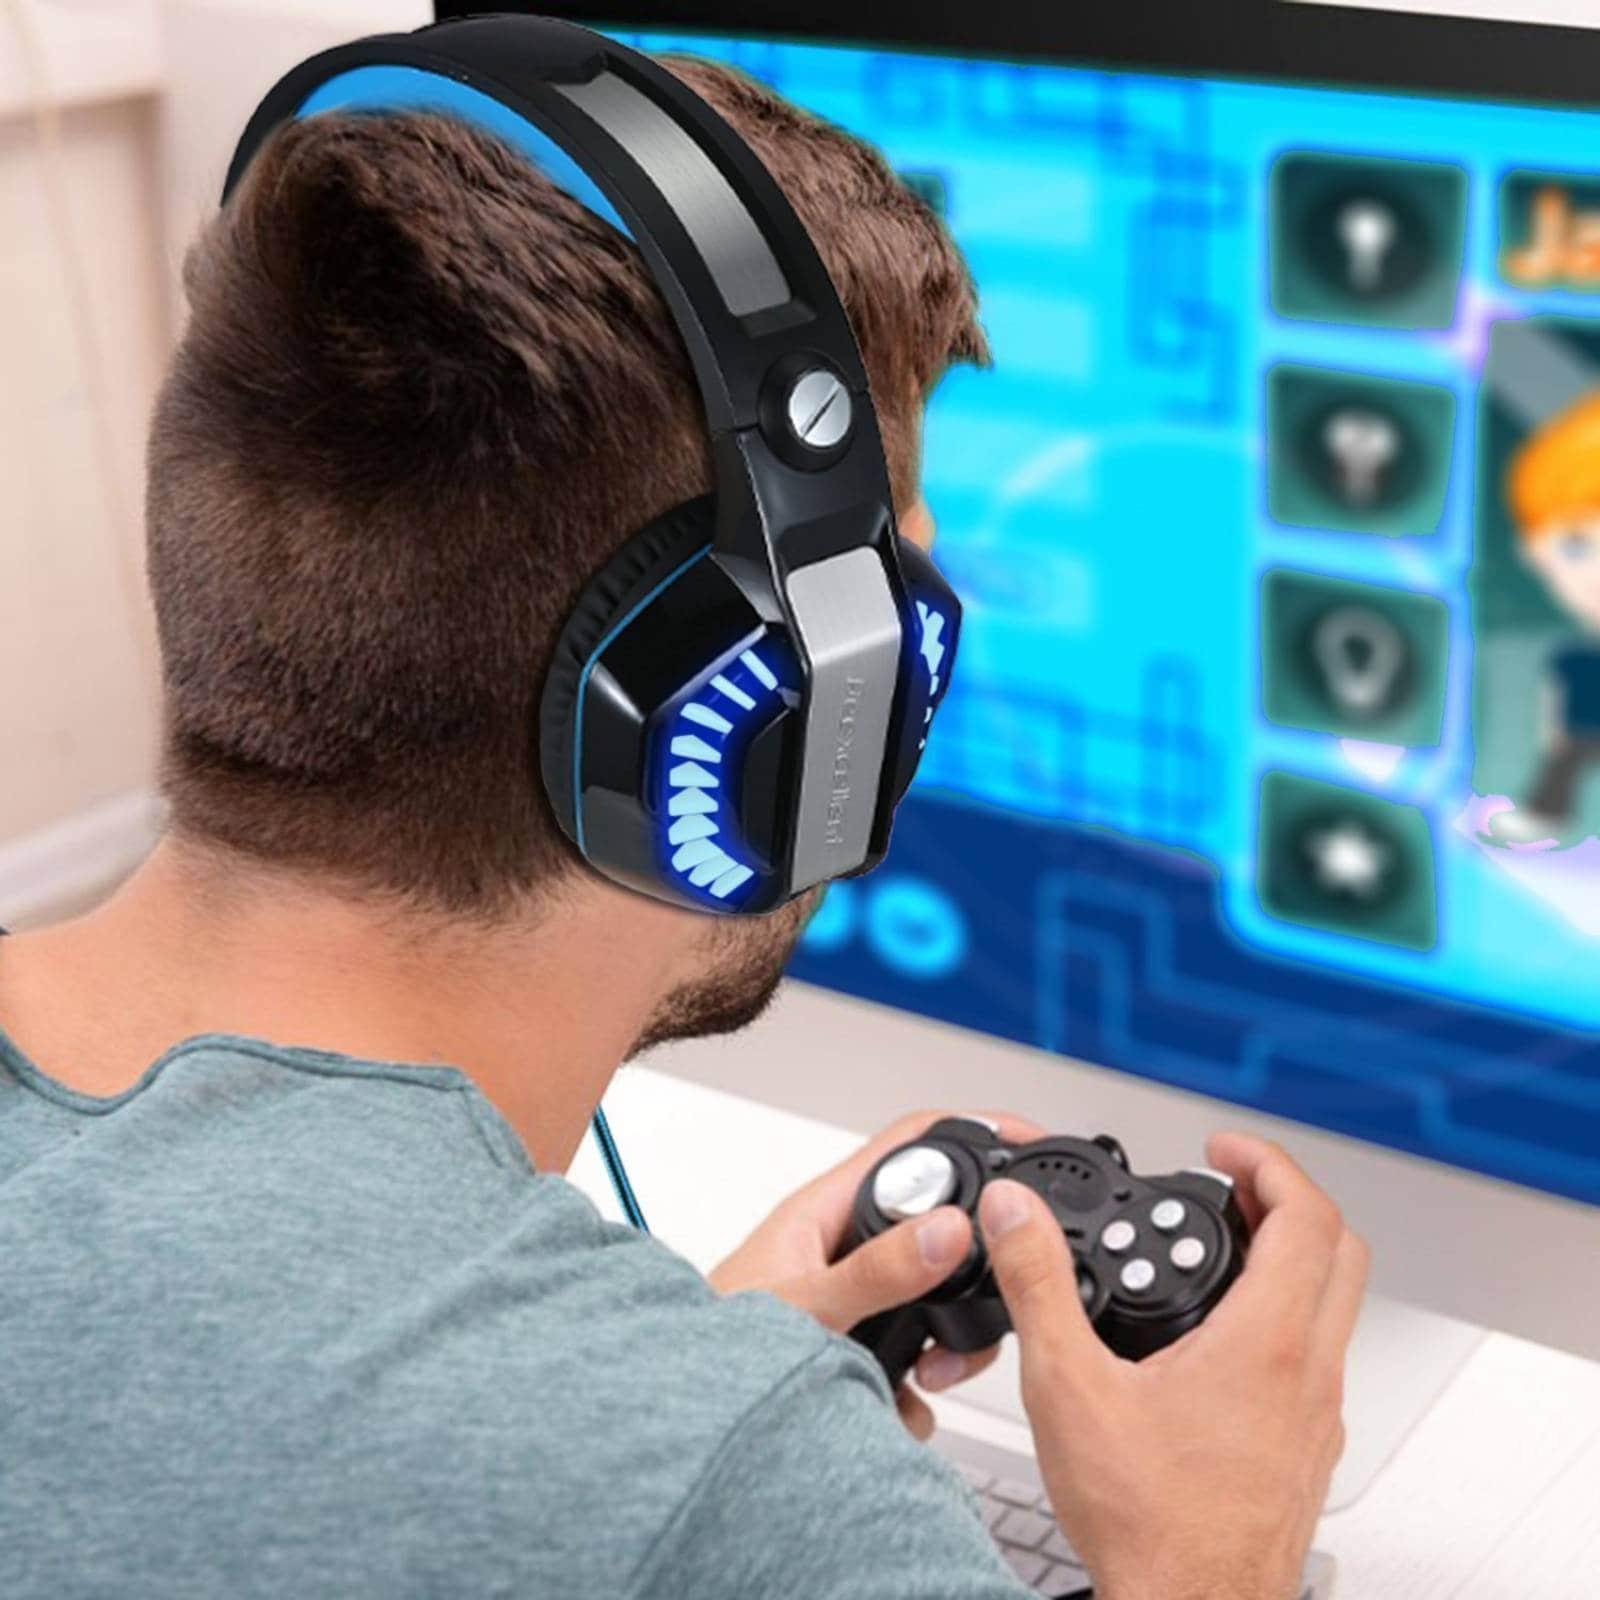 Diadema Gamer Beexcellent Stereo Mic Ps4 Xbox Pc -negro Azul